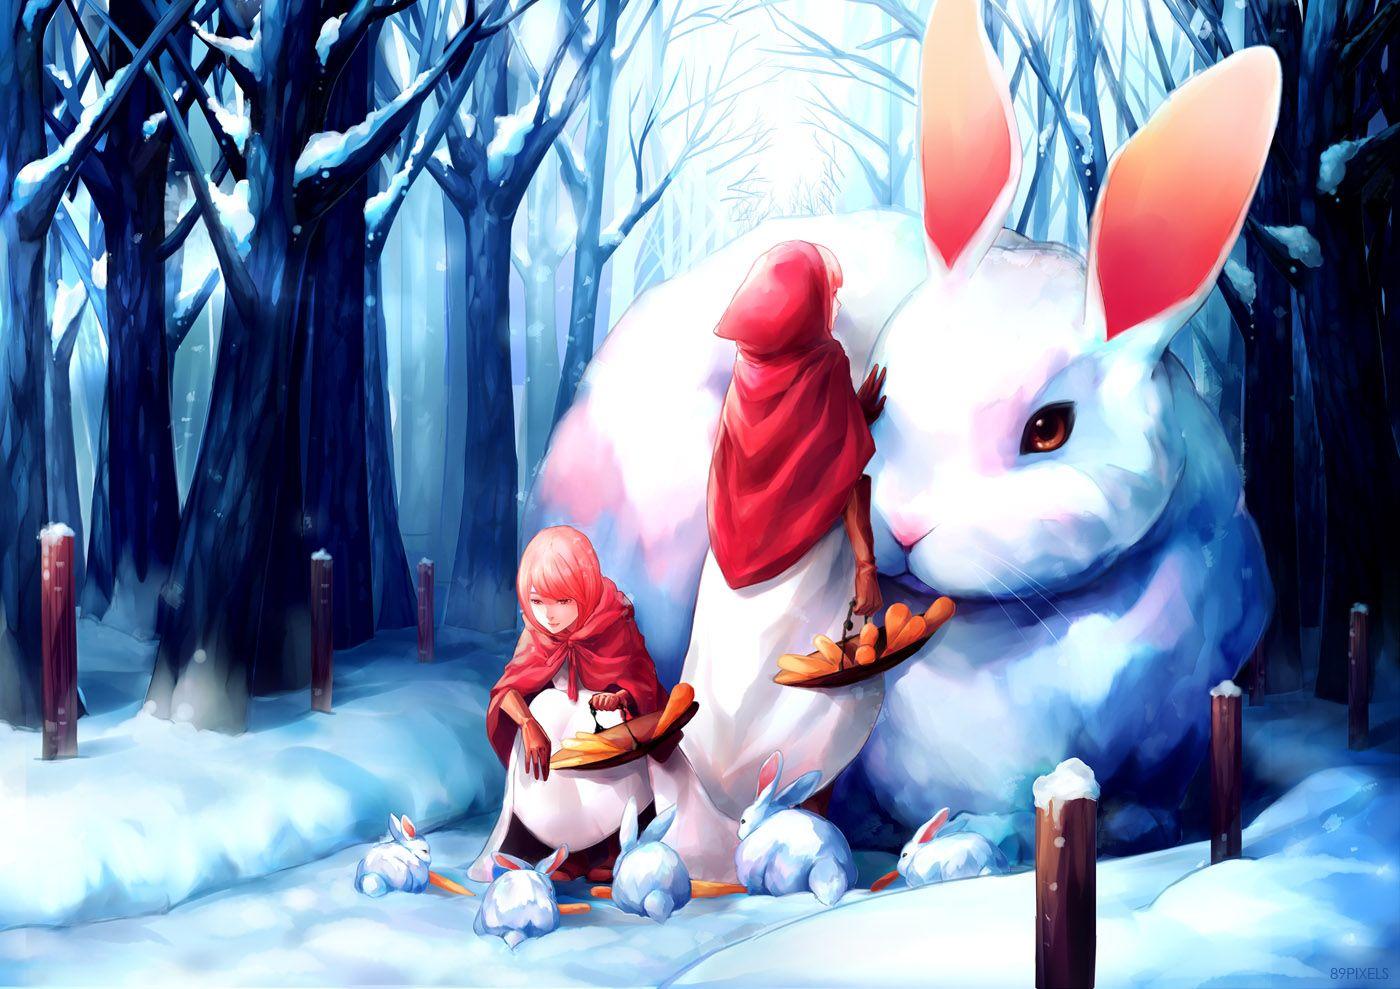 Rabbits of Winteria by 89pixels on DeviantArt